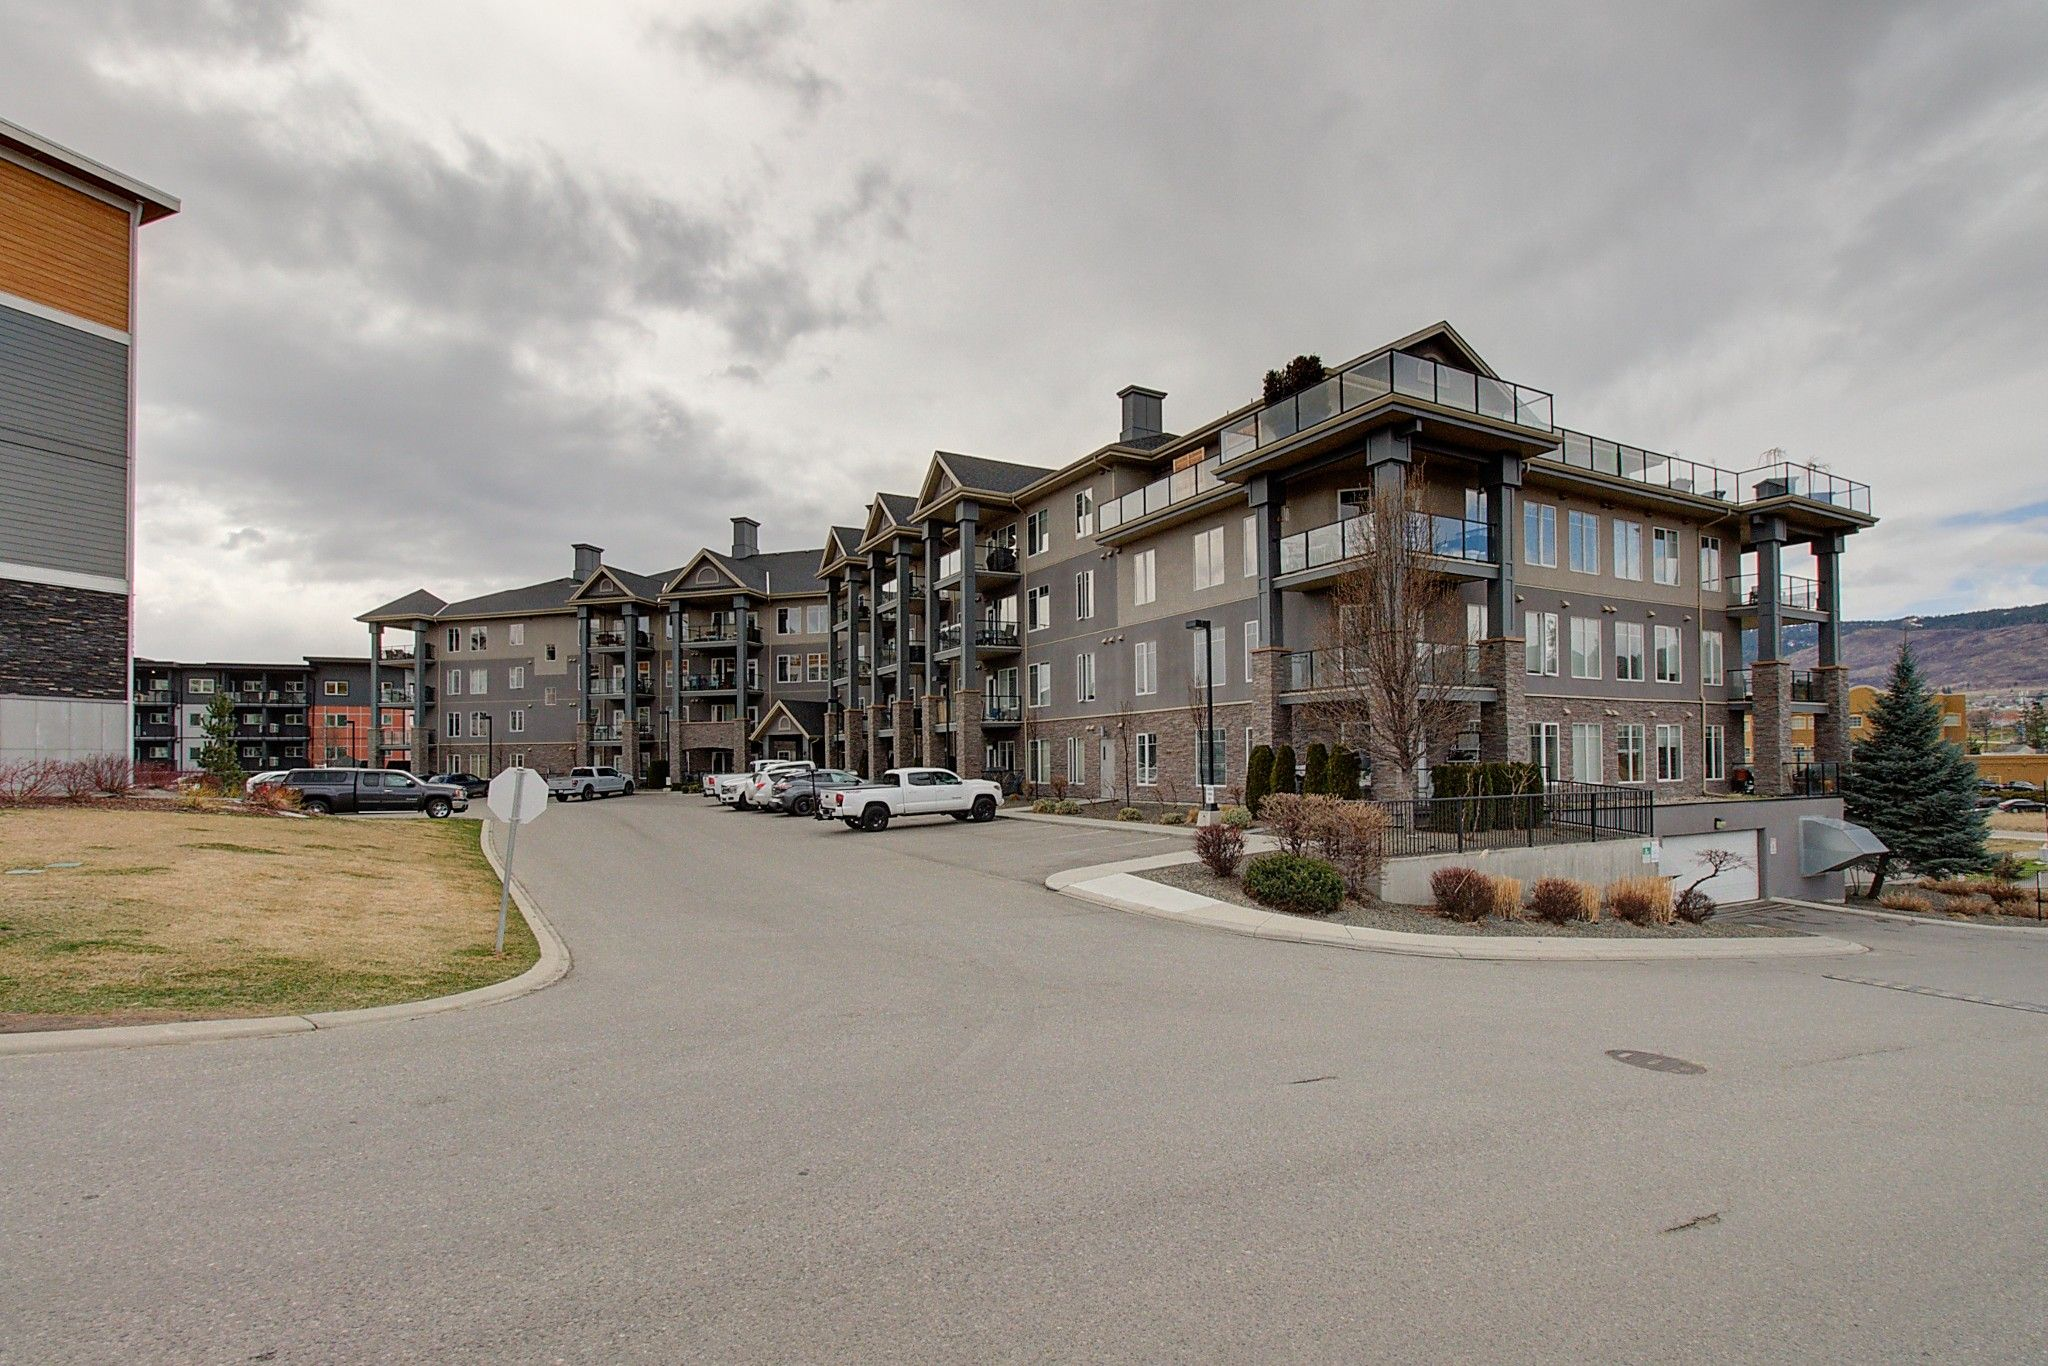 Main Photo: 417 3645 Carrington Road in West Kelowna: Westbank Centre Multi-family for sale (Central Okanagan)  : MLS®# 10229820